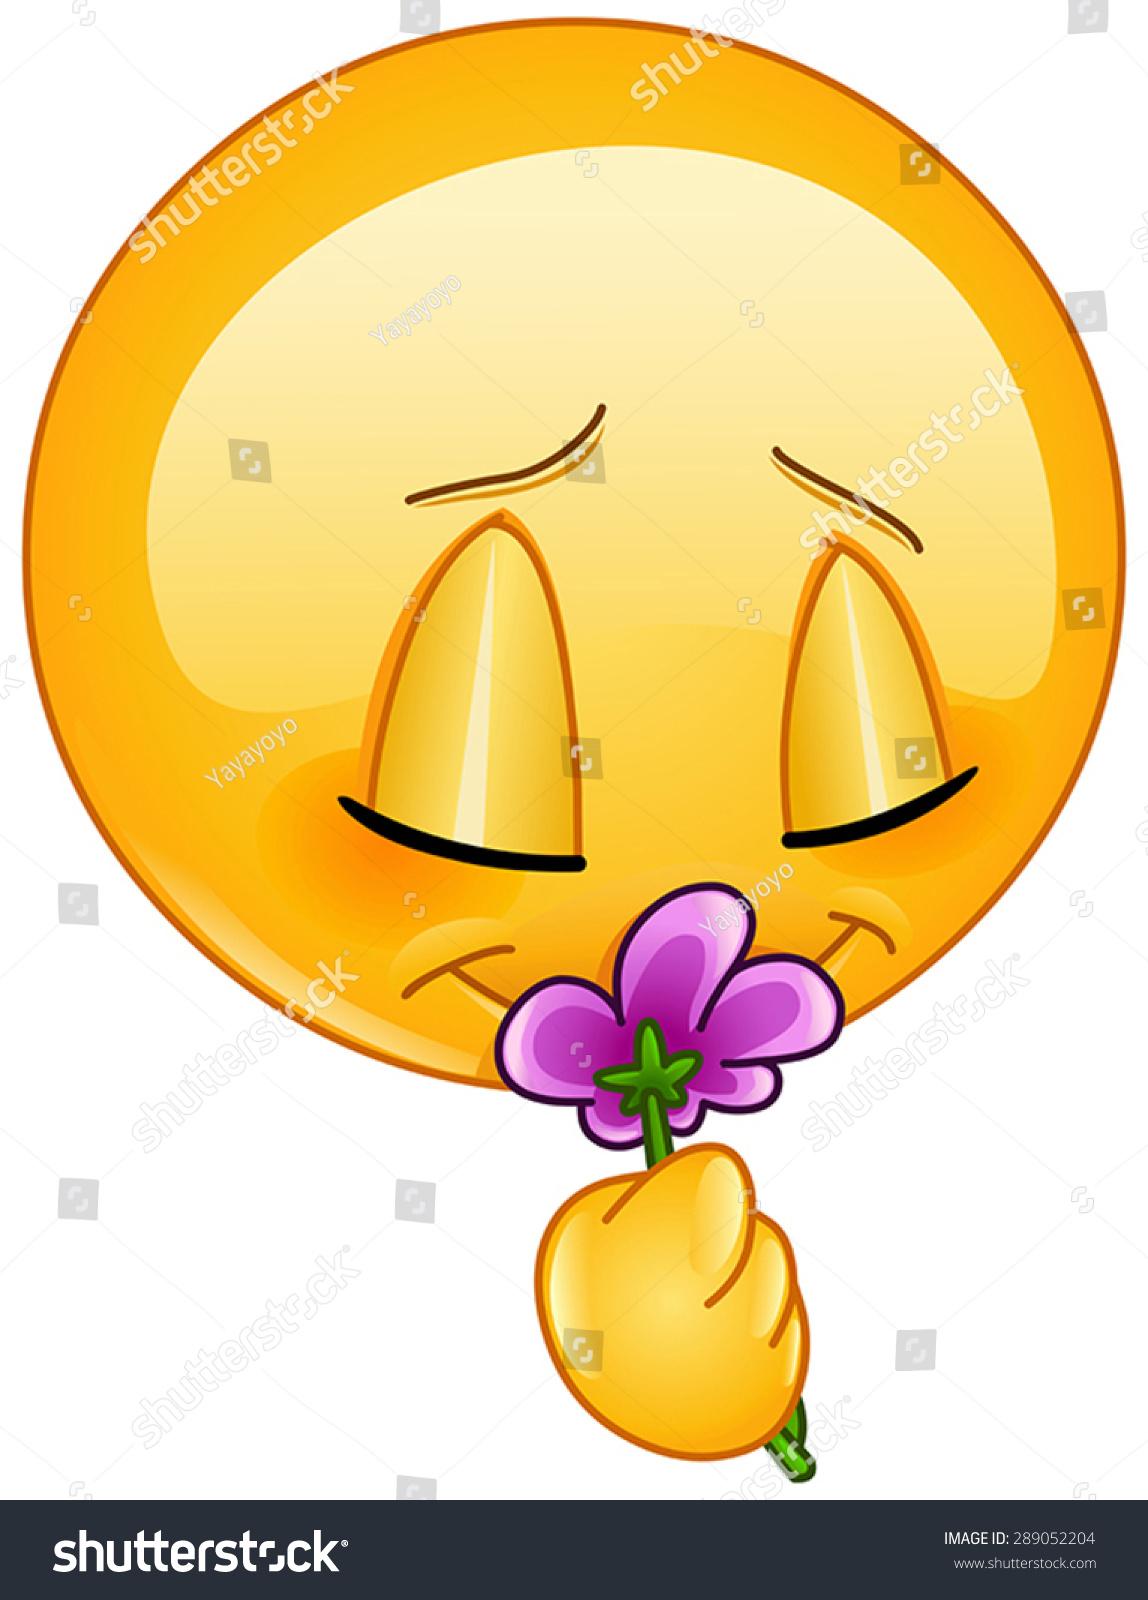 Emoticon Smelling A Flower Stock Vector Illustration Shutterstock